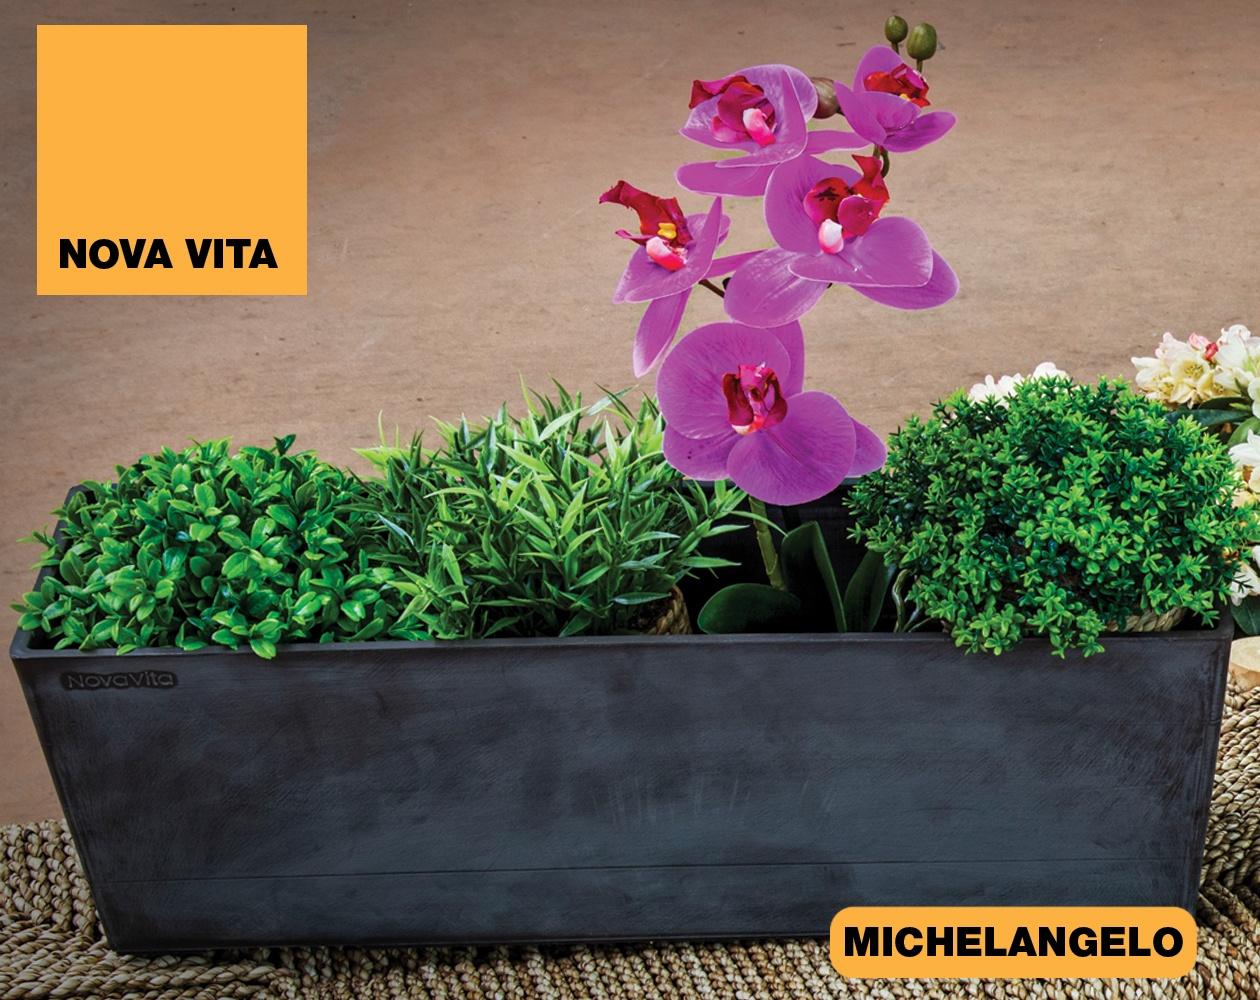 Michelangelo Vasi in plastica riciclata linea Nova Vita Art Plast